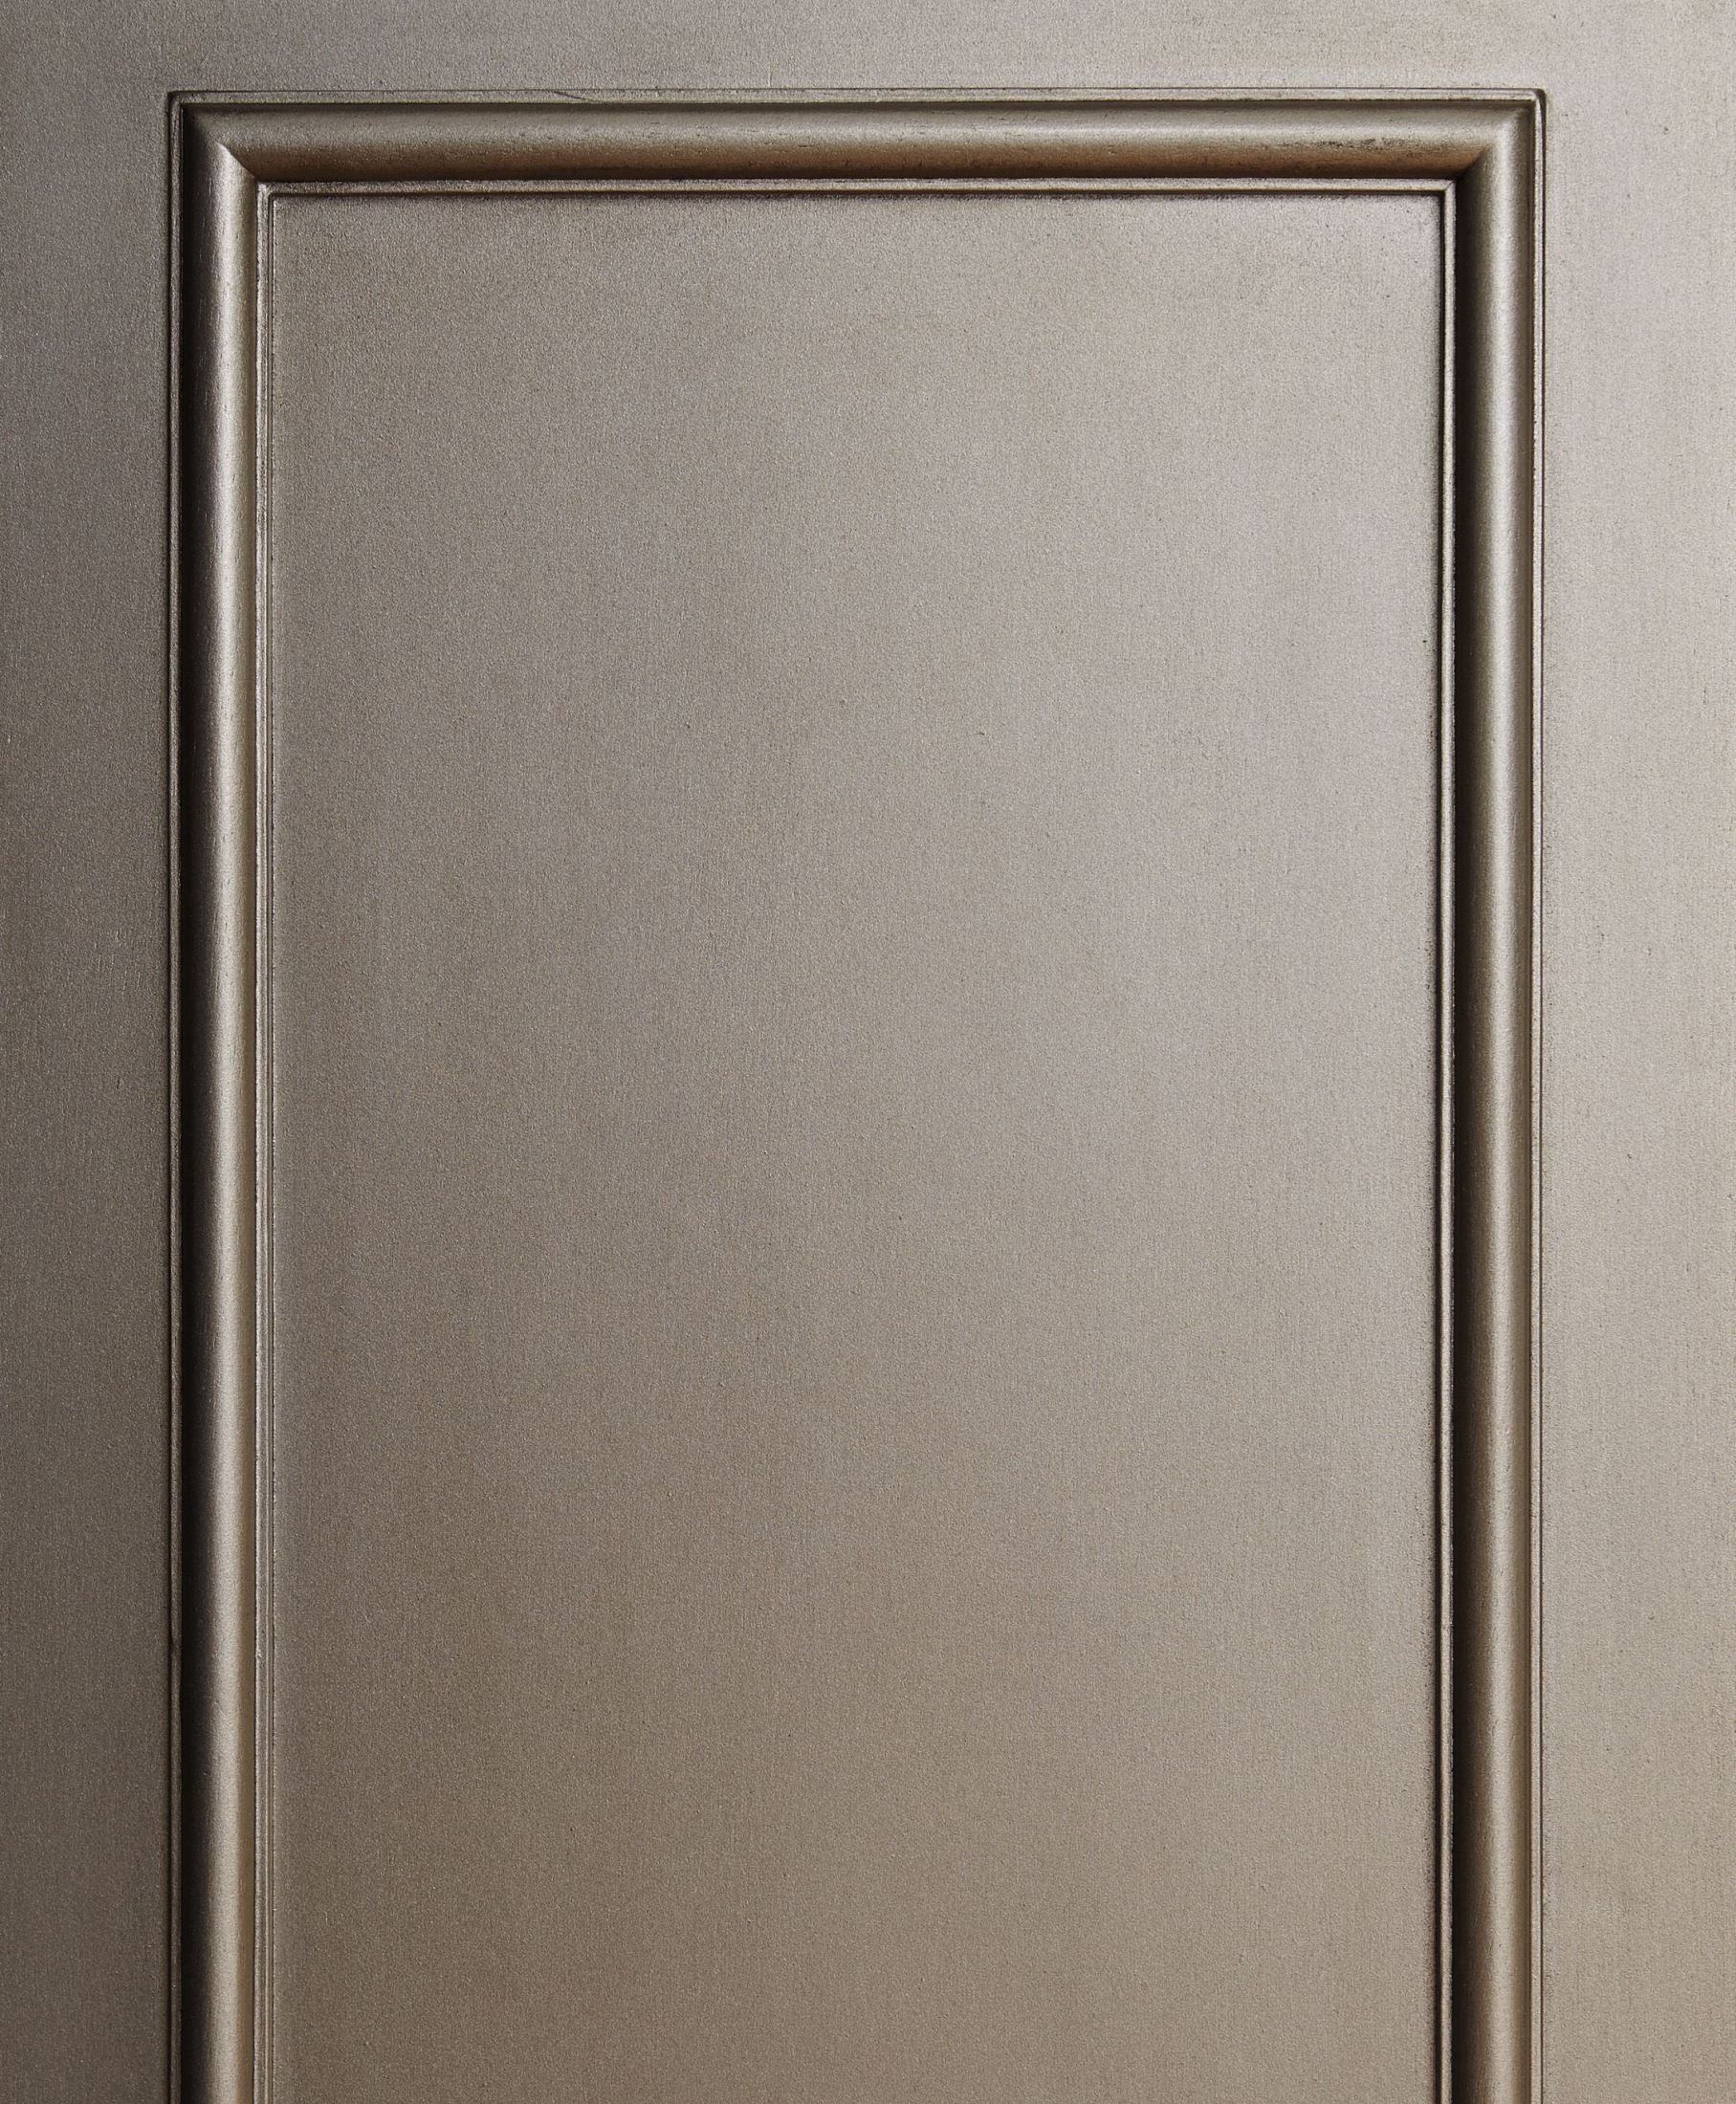 Birlanny Silver Upholstered Panel Bedroom Set Media Gallery 9